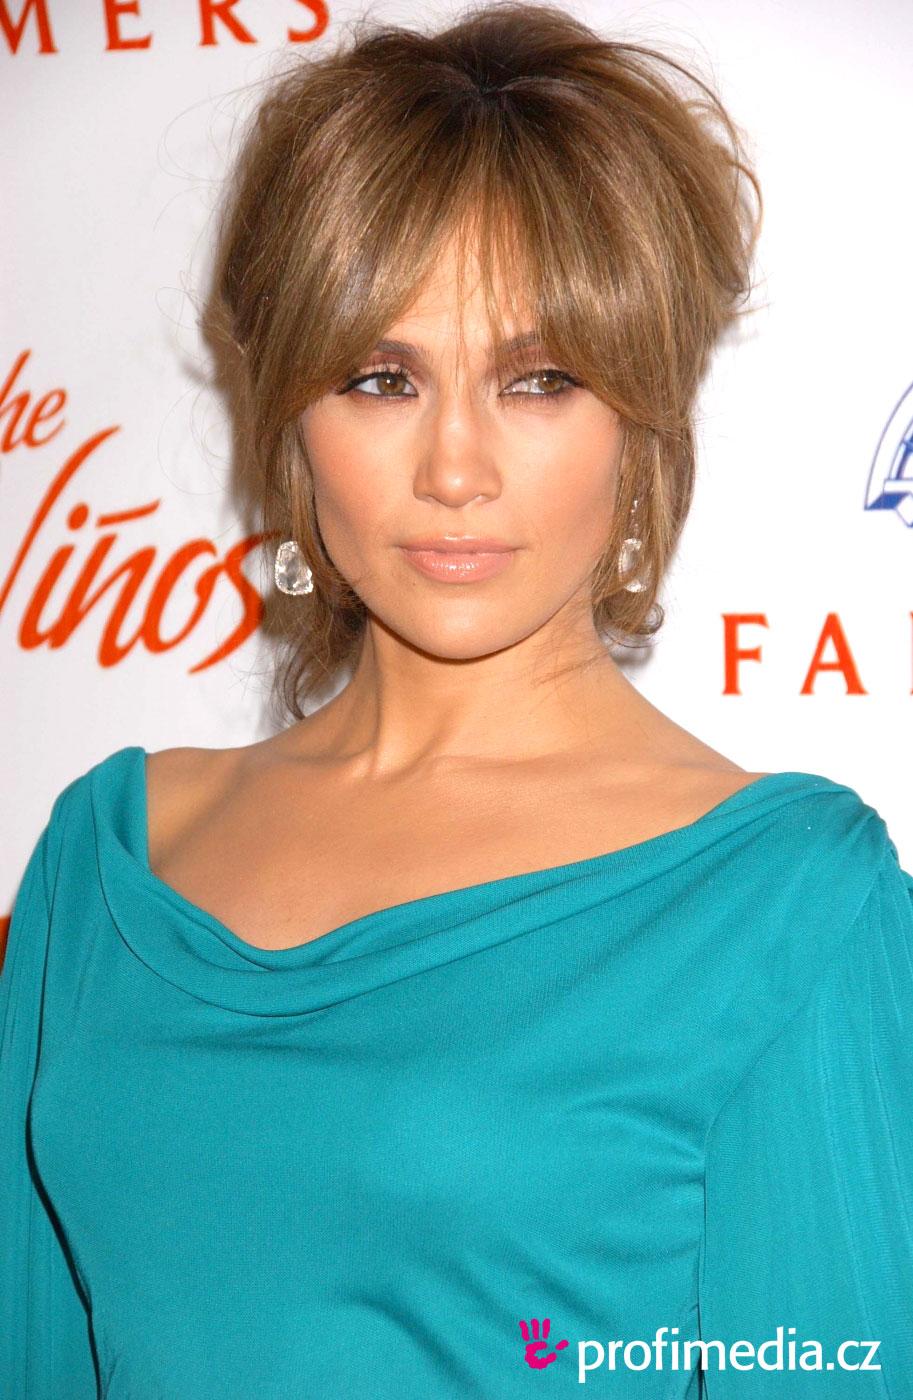 Jennifer Lopez Hairstyle Easyhairstyler